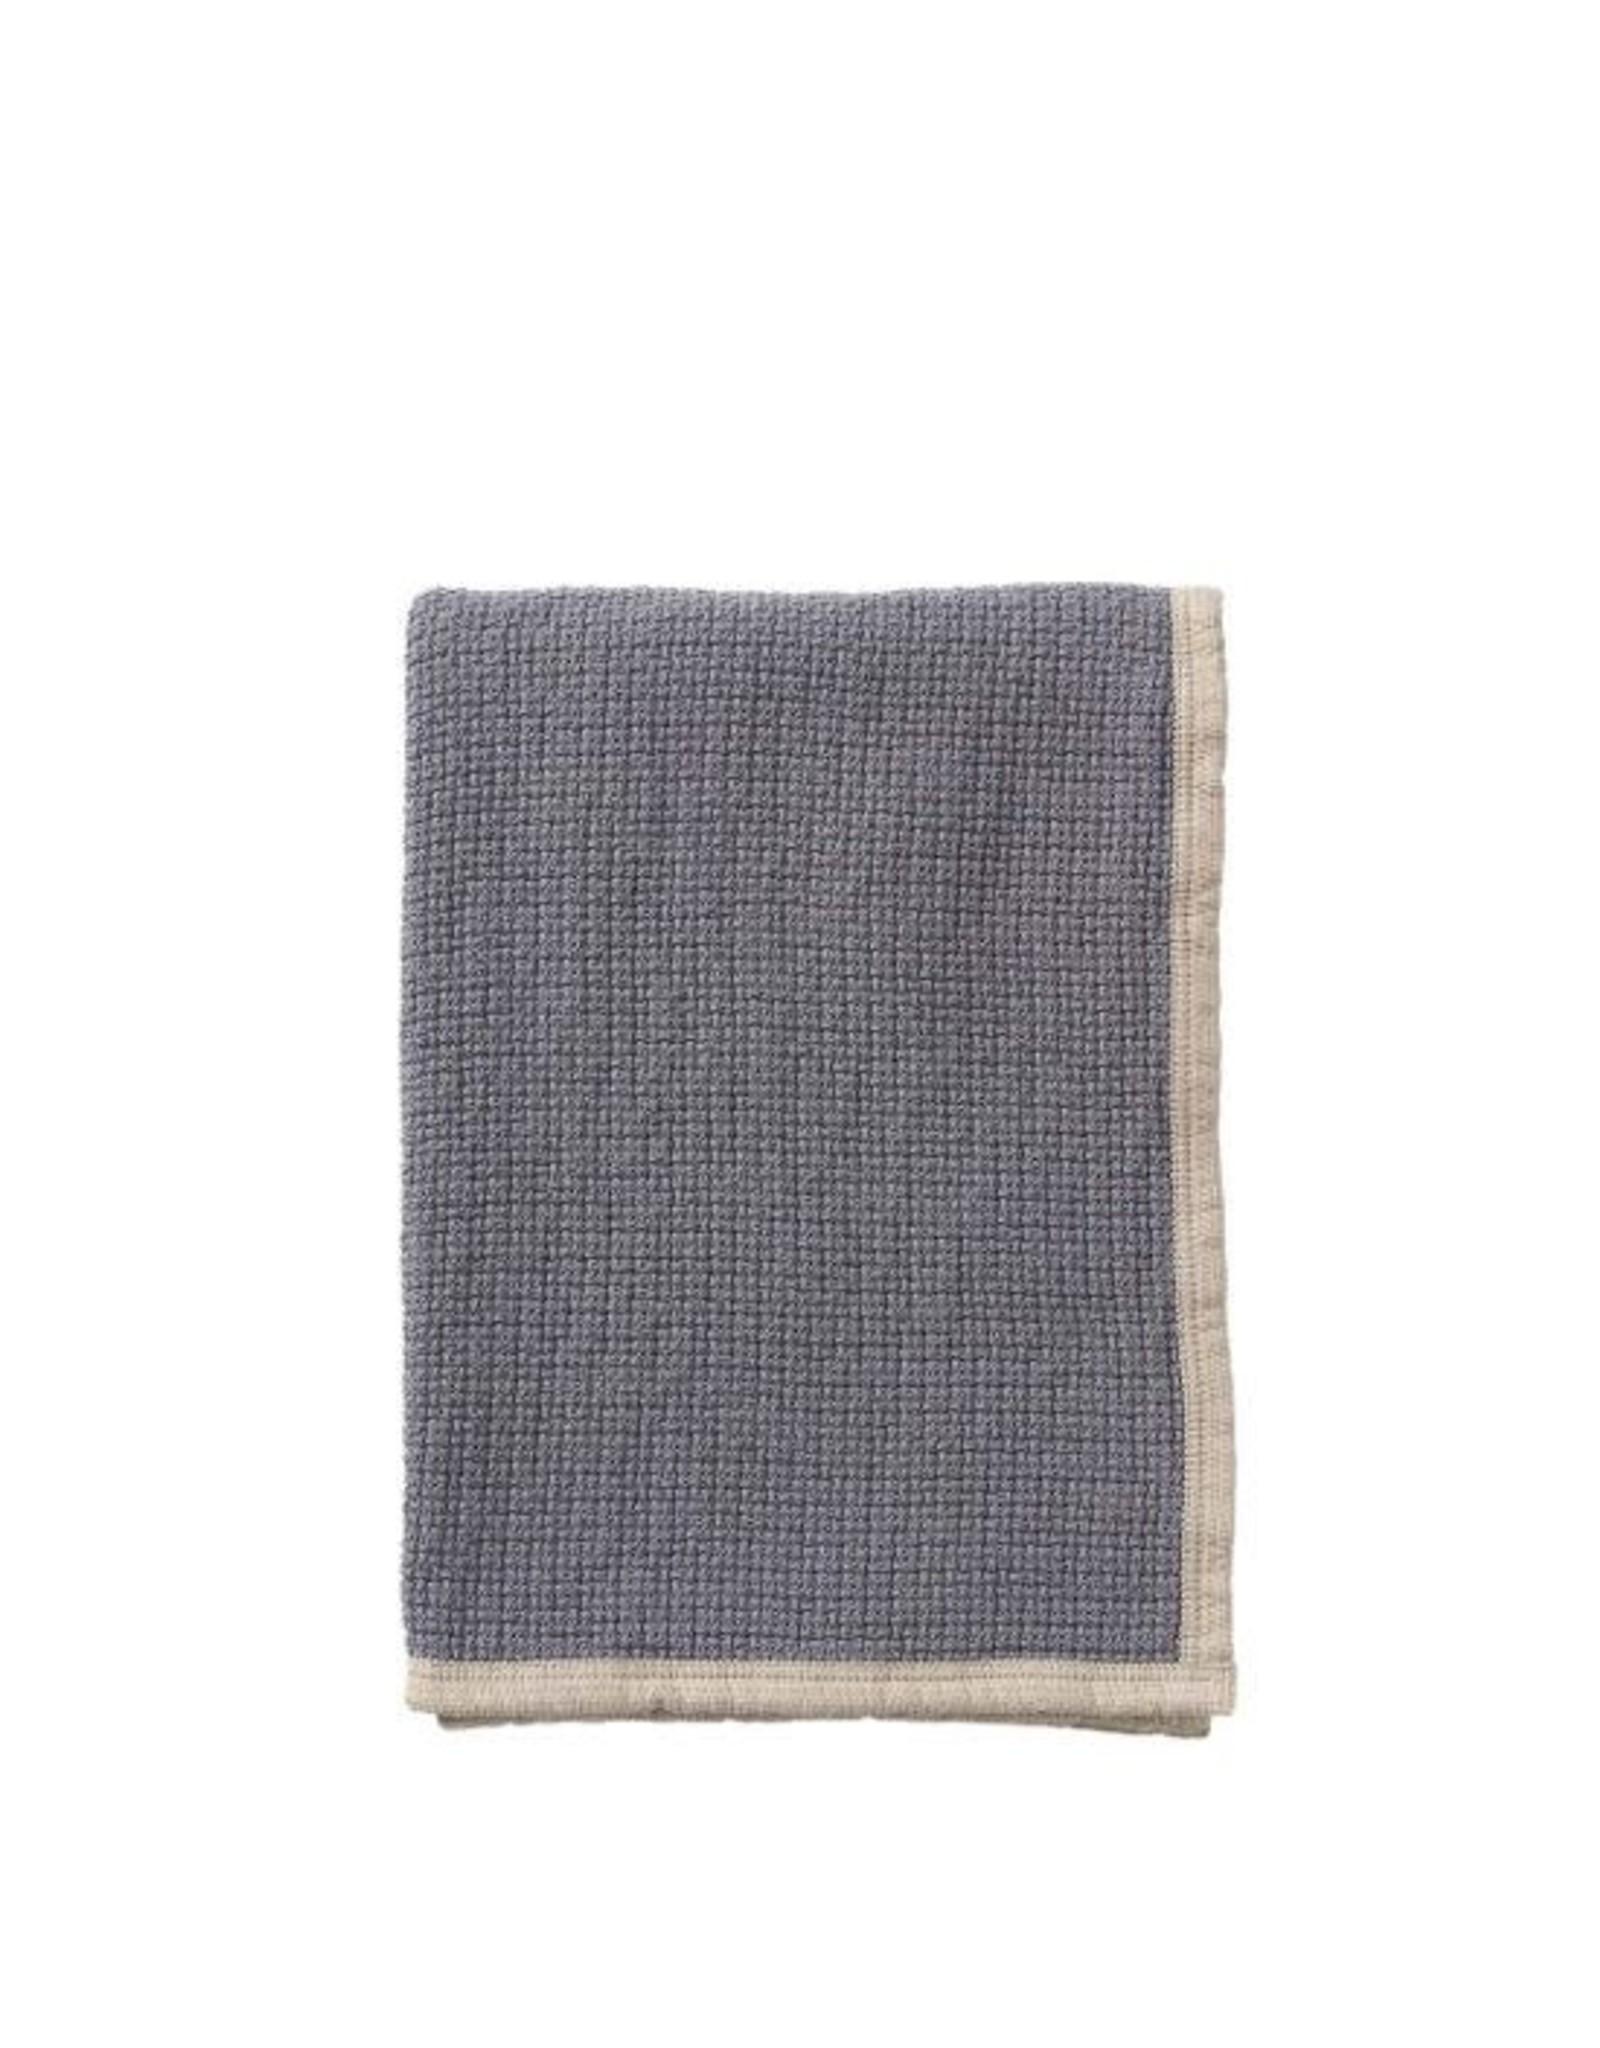 Klippan Decor Blanket - Warm Grey